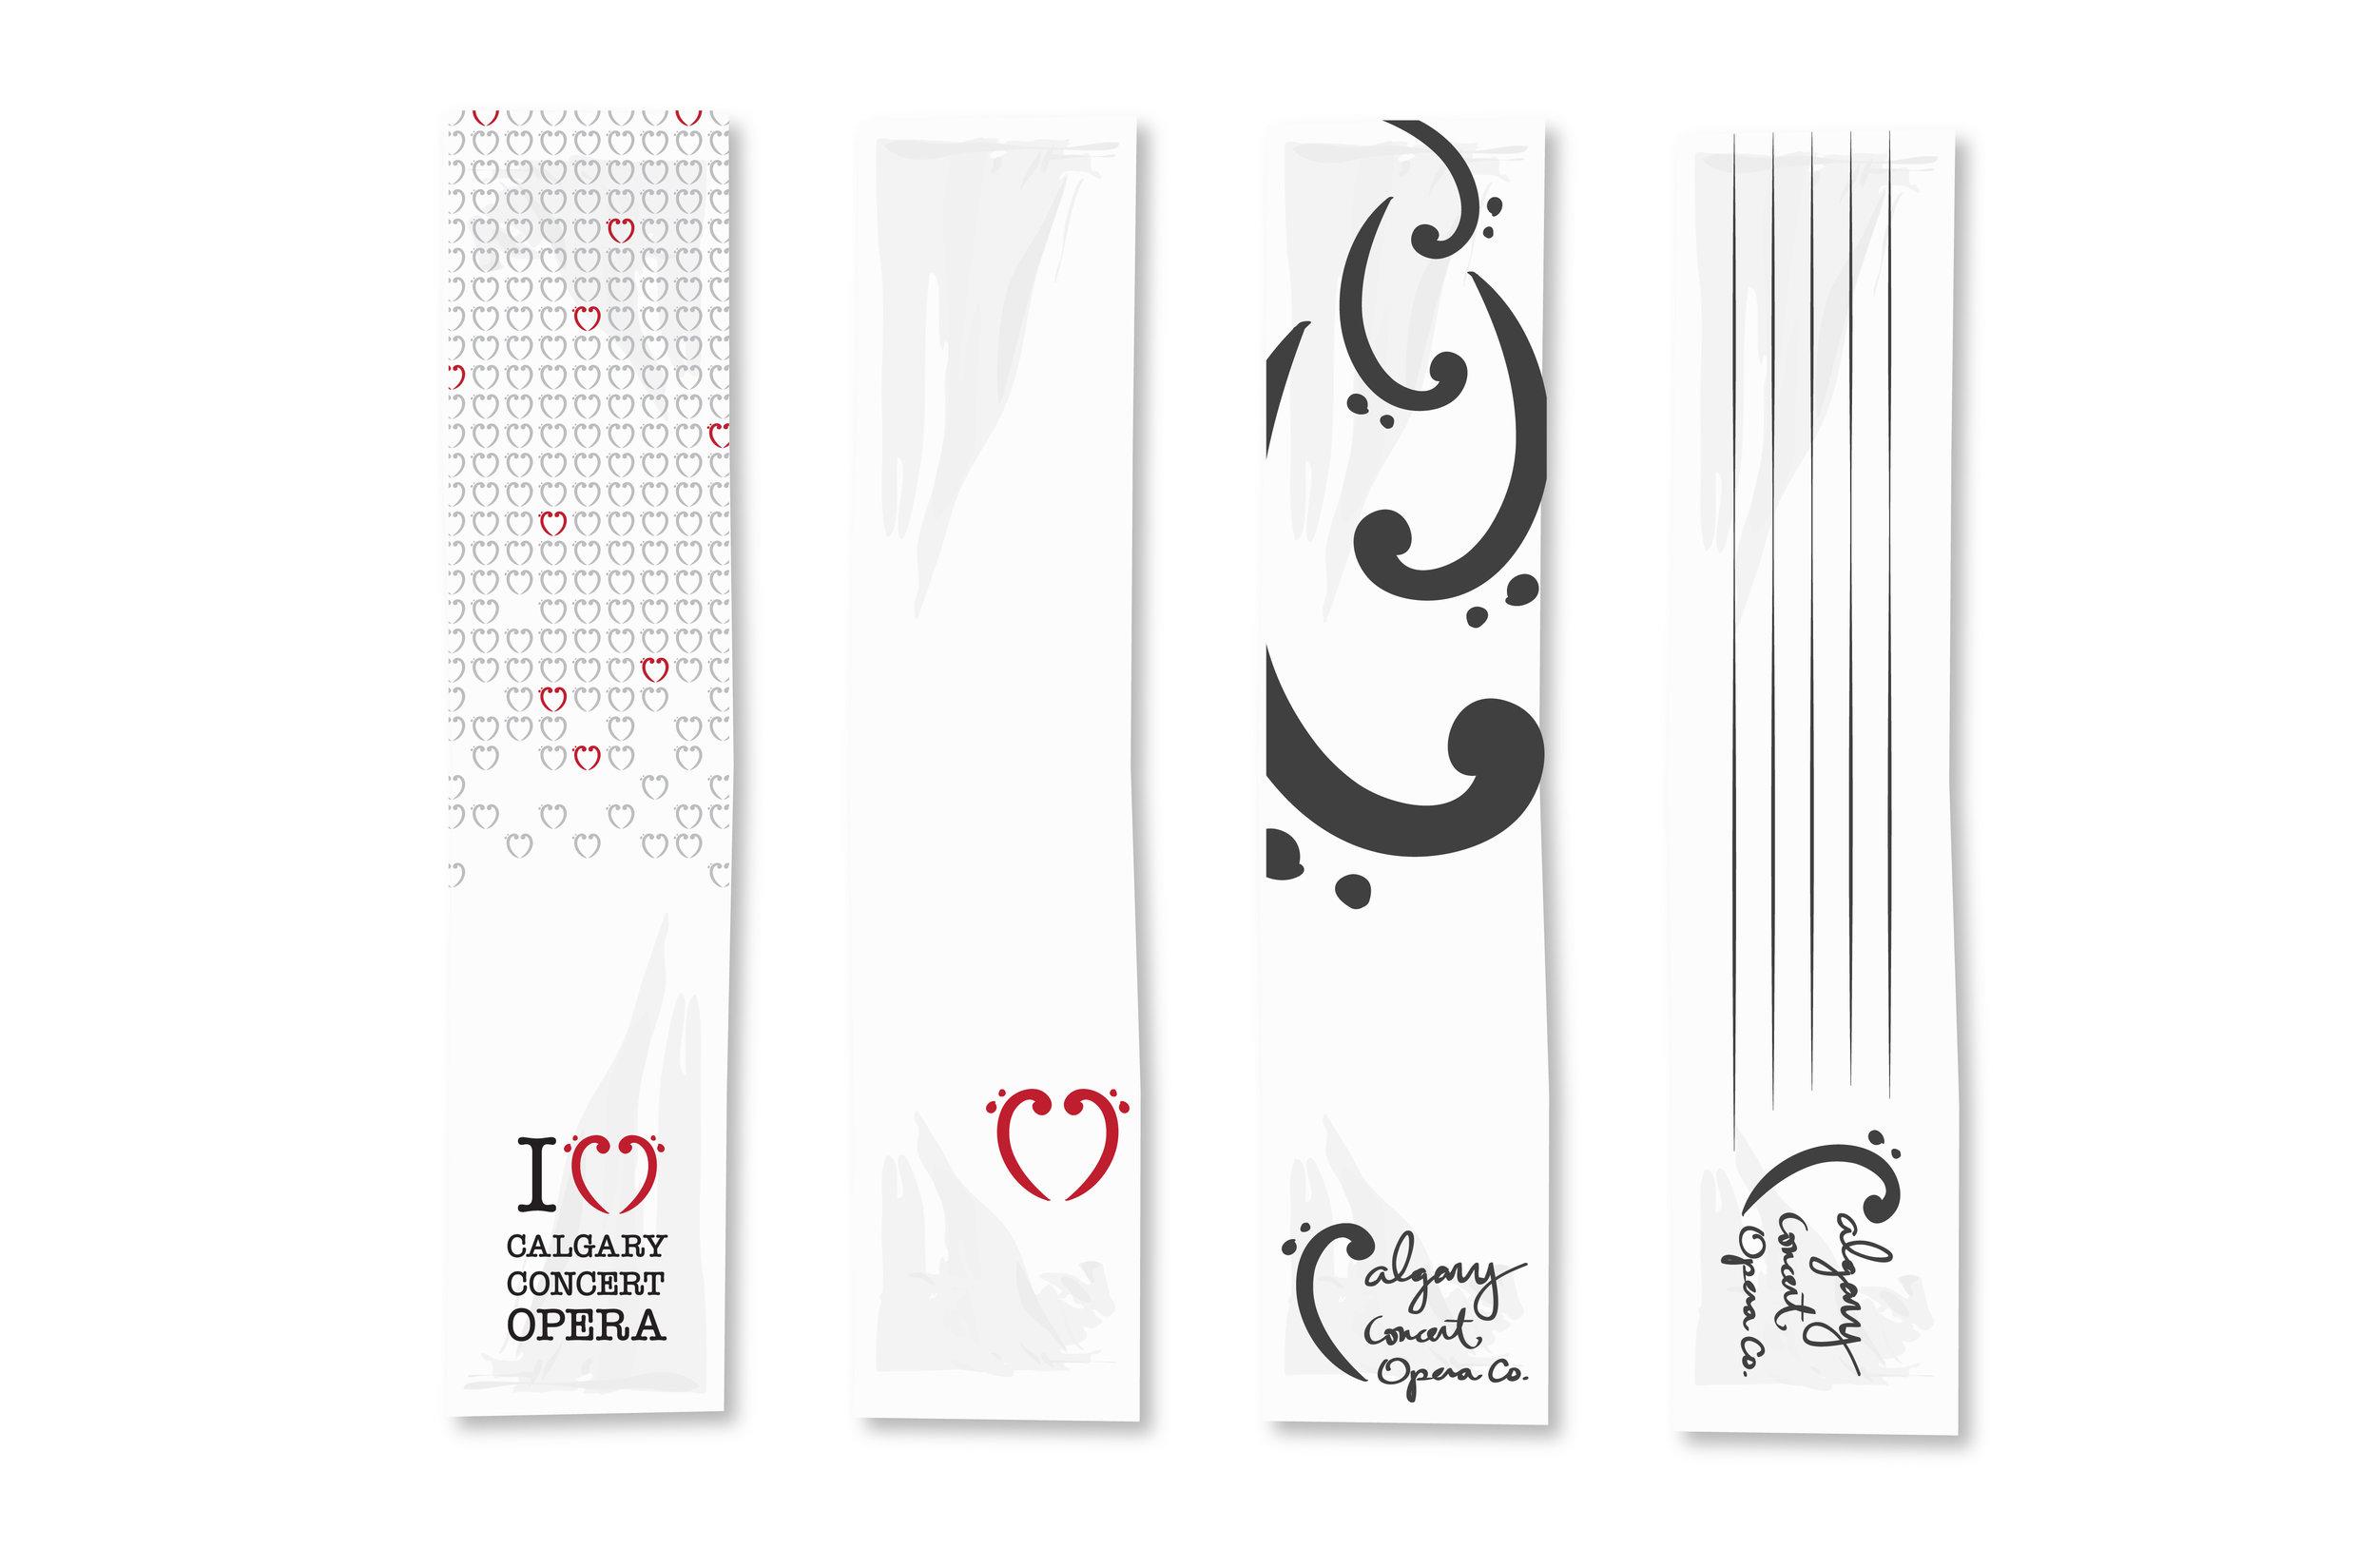 20121009_CCOC_Shirts&Scarves-3.jpg